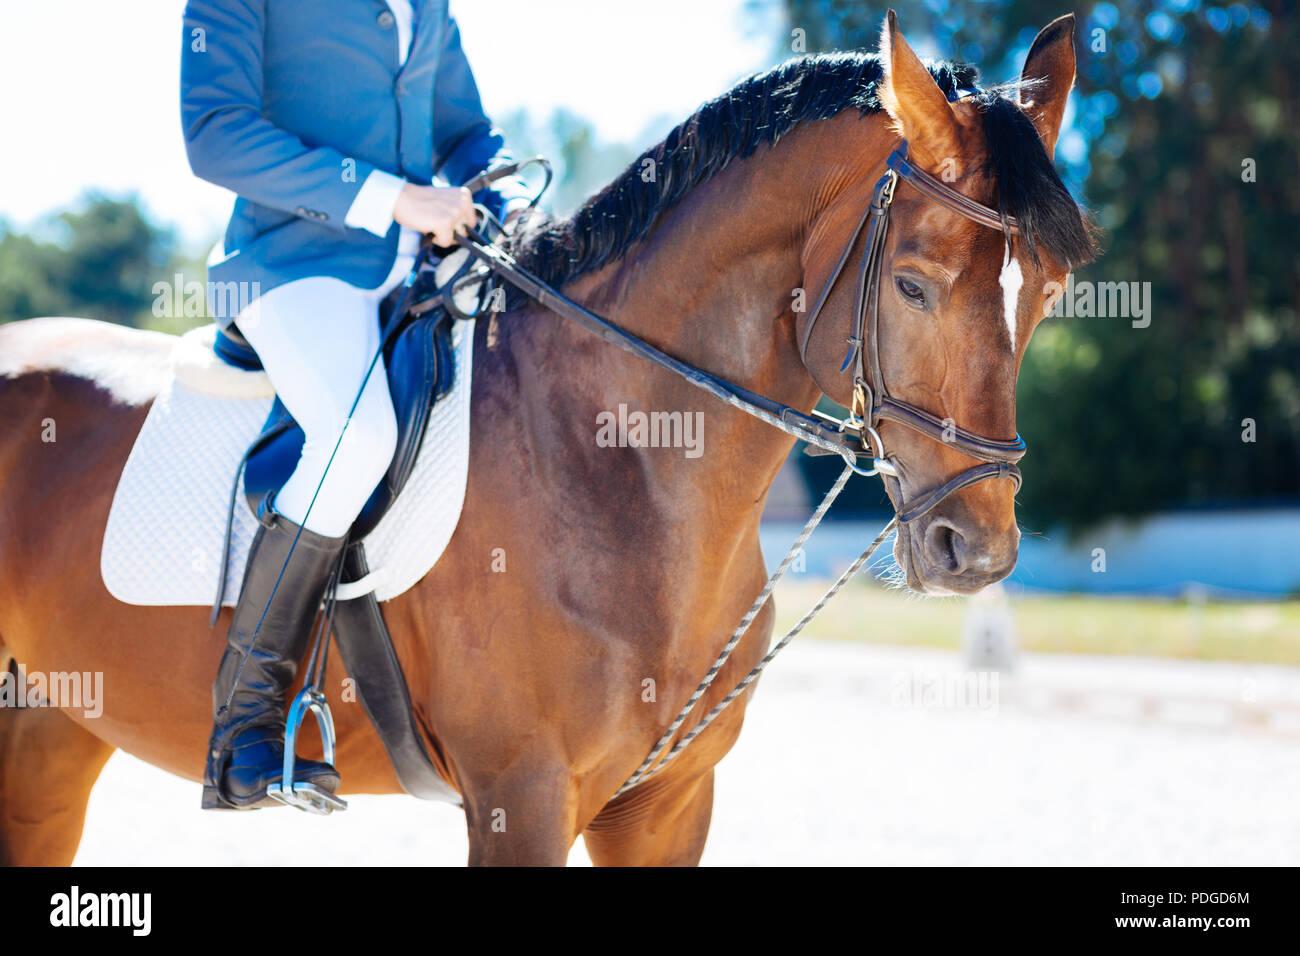 Experienced a horseman enjoying his favorite activity - Stock Image